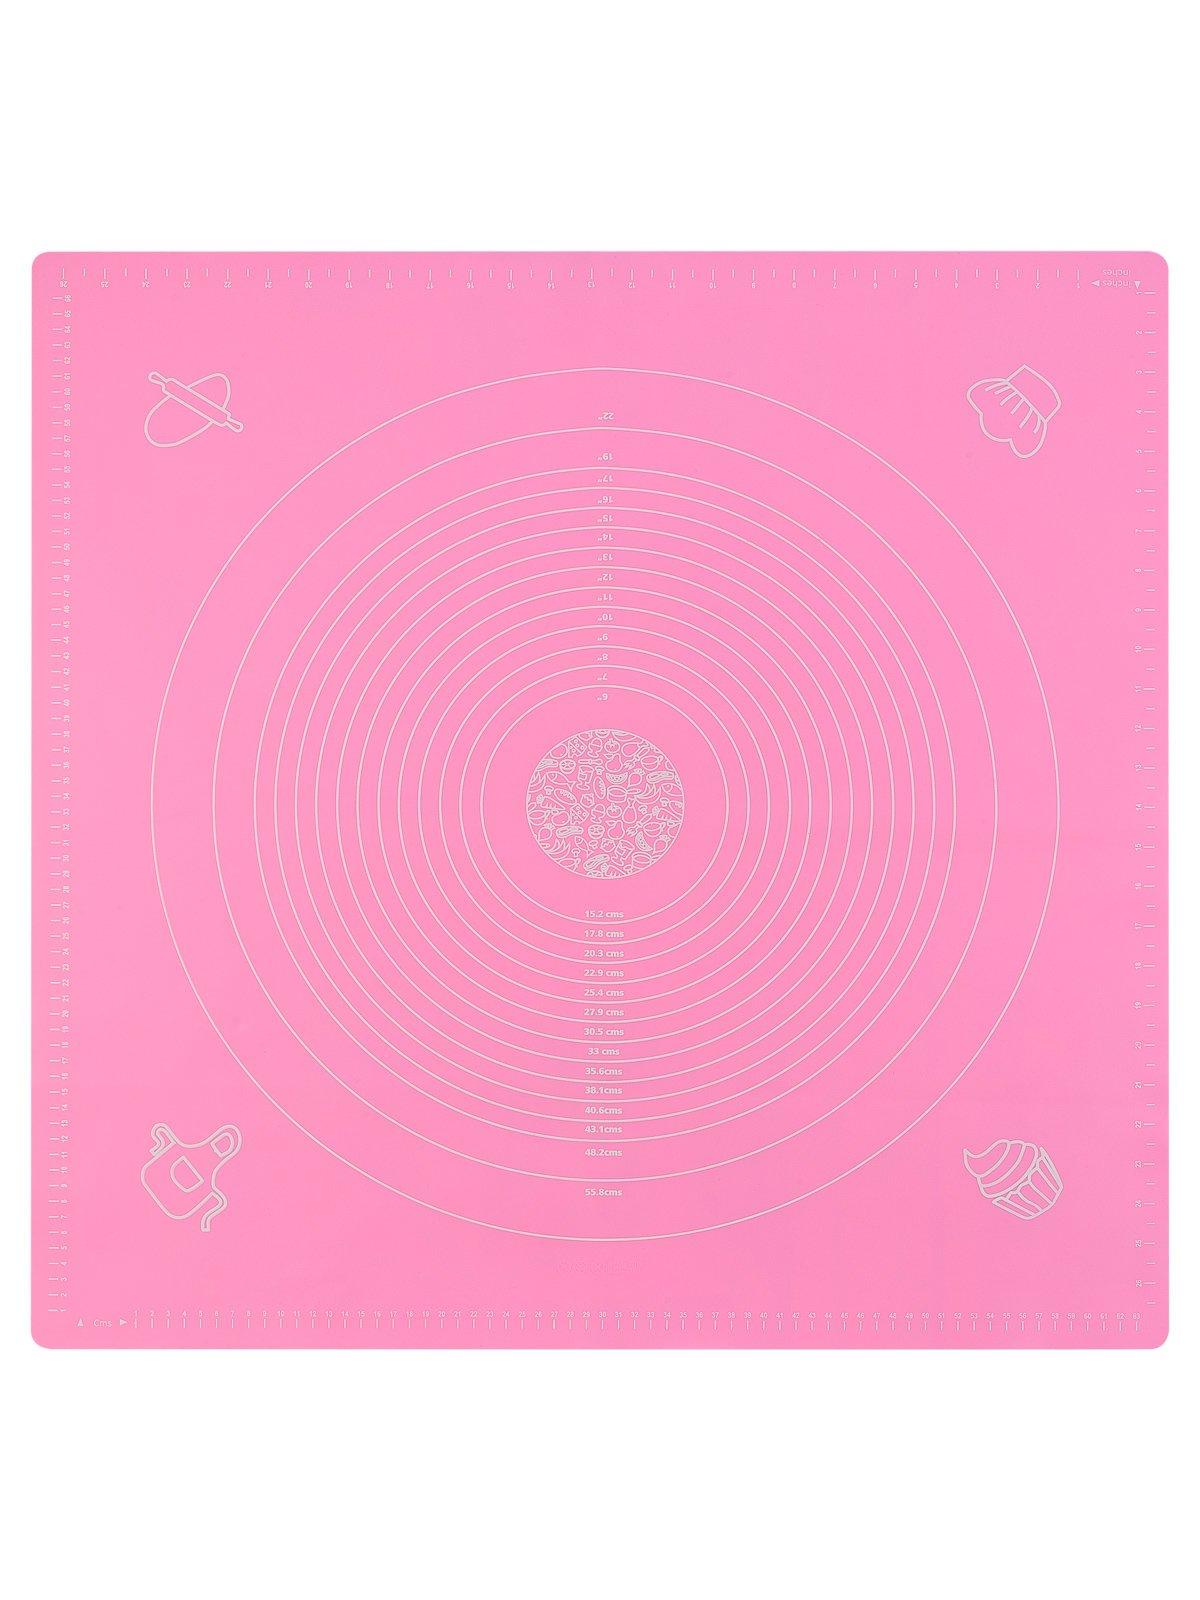 Форма для выпечки HomeMaster 210, SHM025-2, розовый